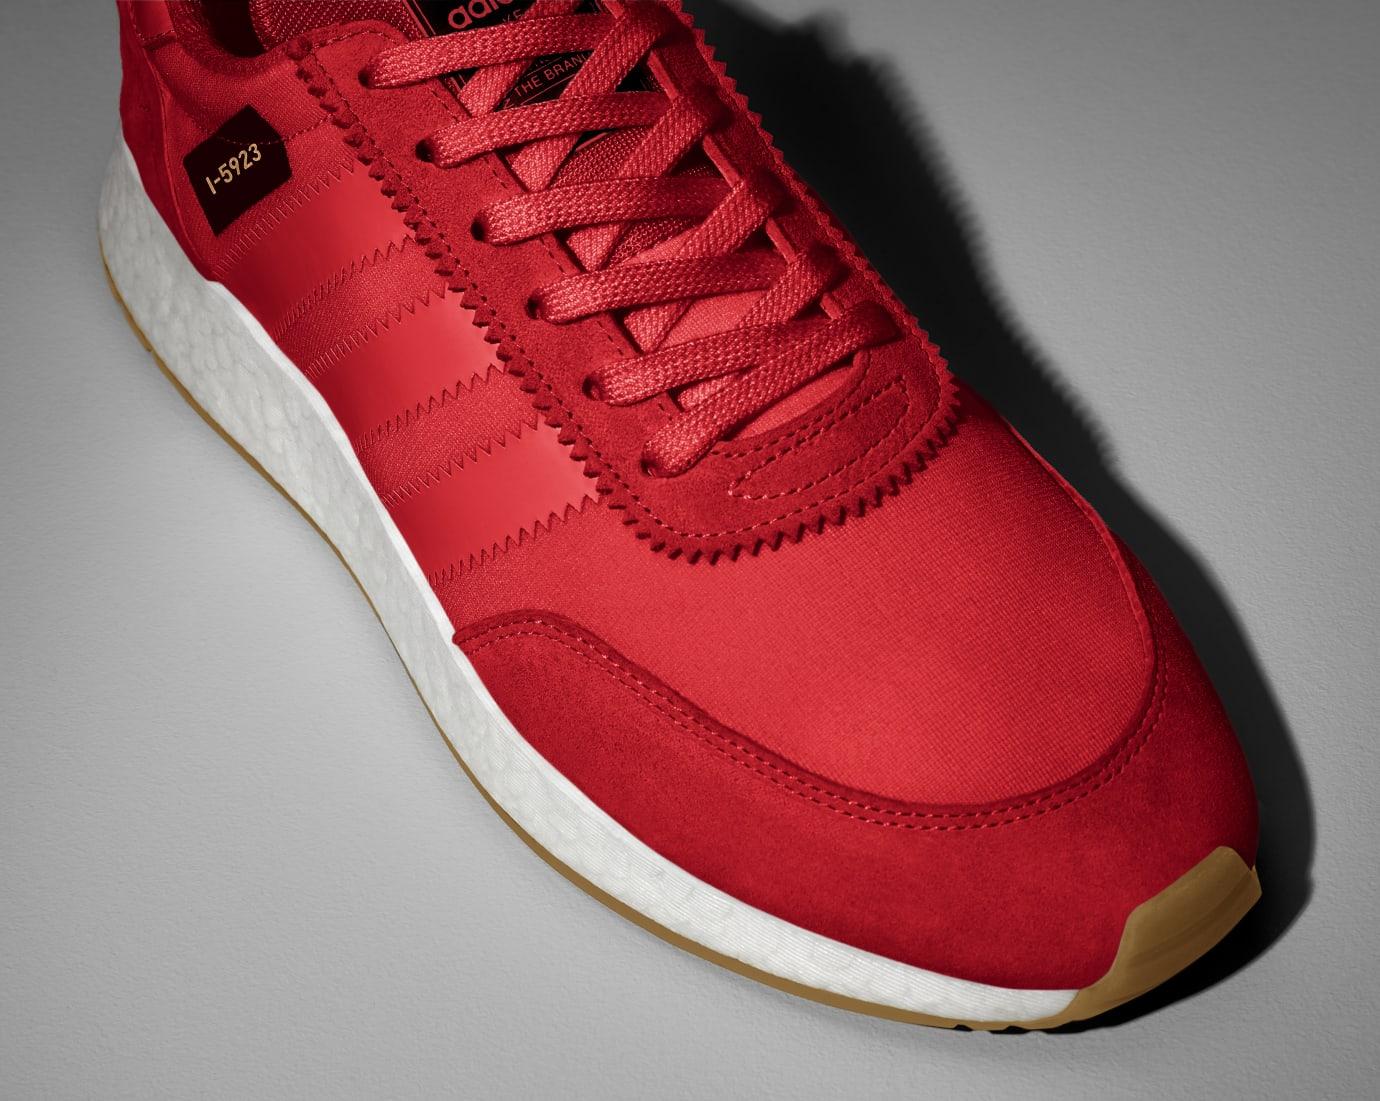 separation shoes ba317 825f1 Image via Adidas Adidas I-5923 Runner